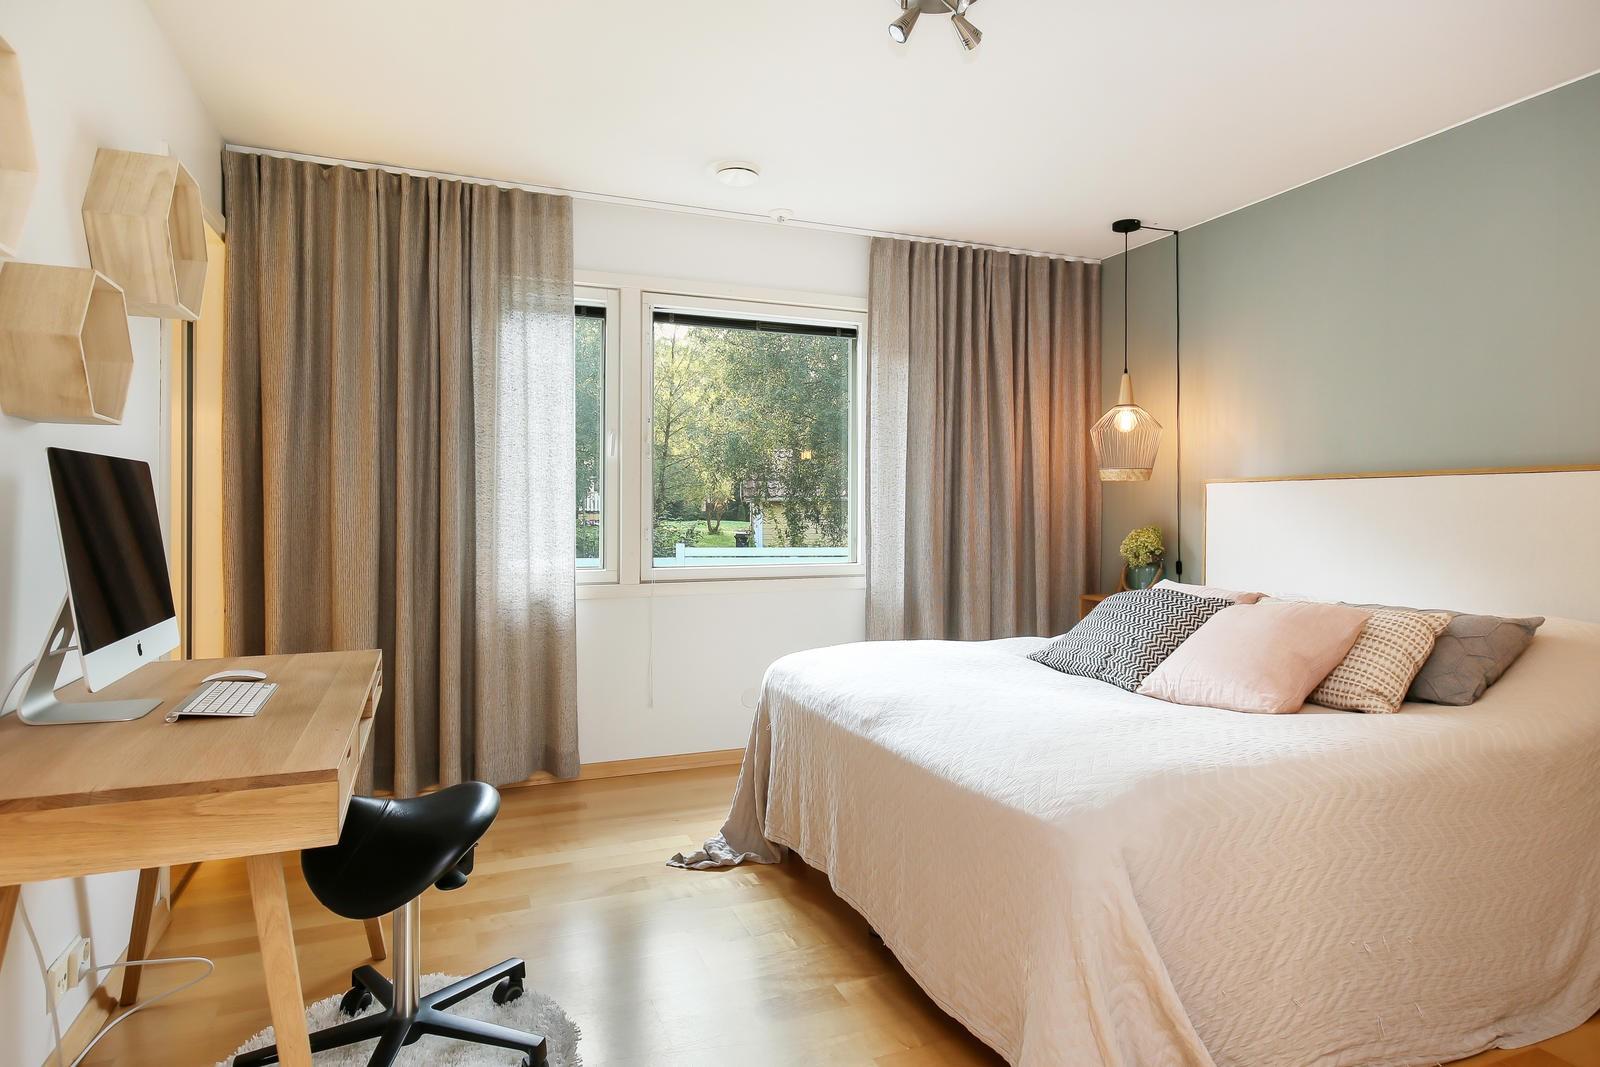 Omakotitalo Uudellamaalla makuuhuone